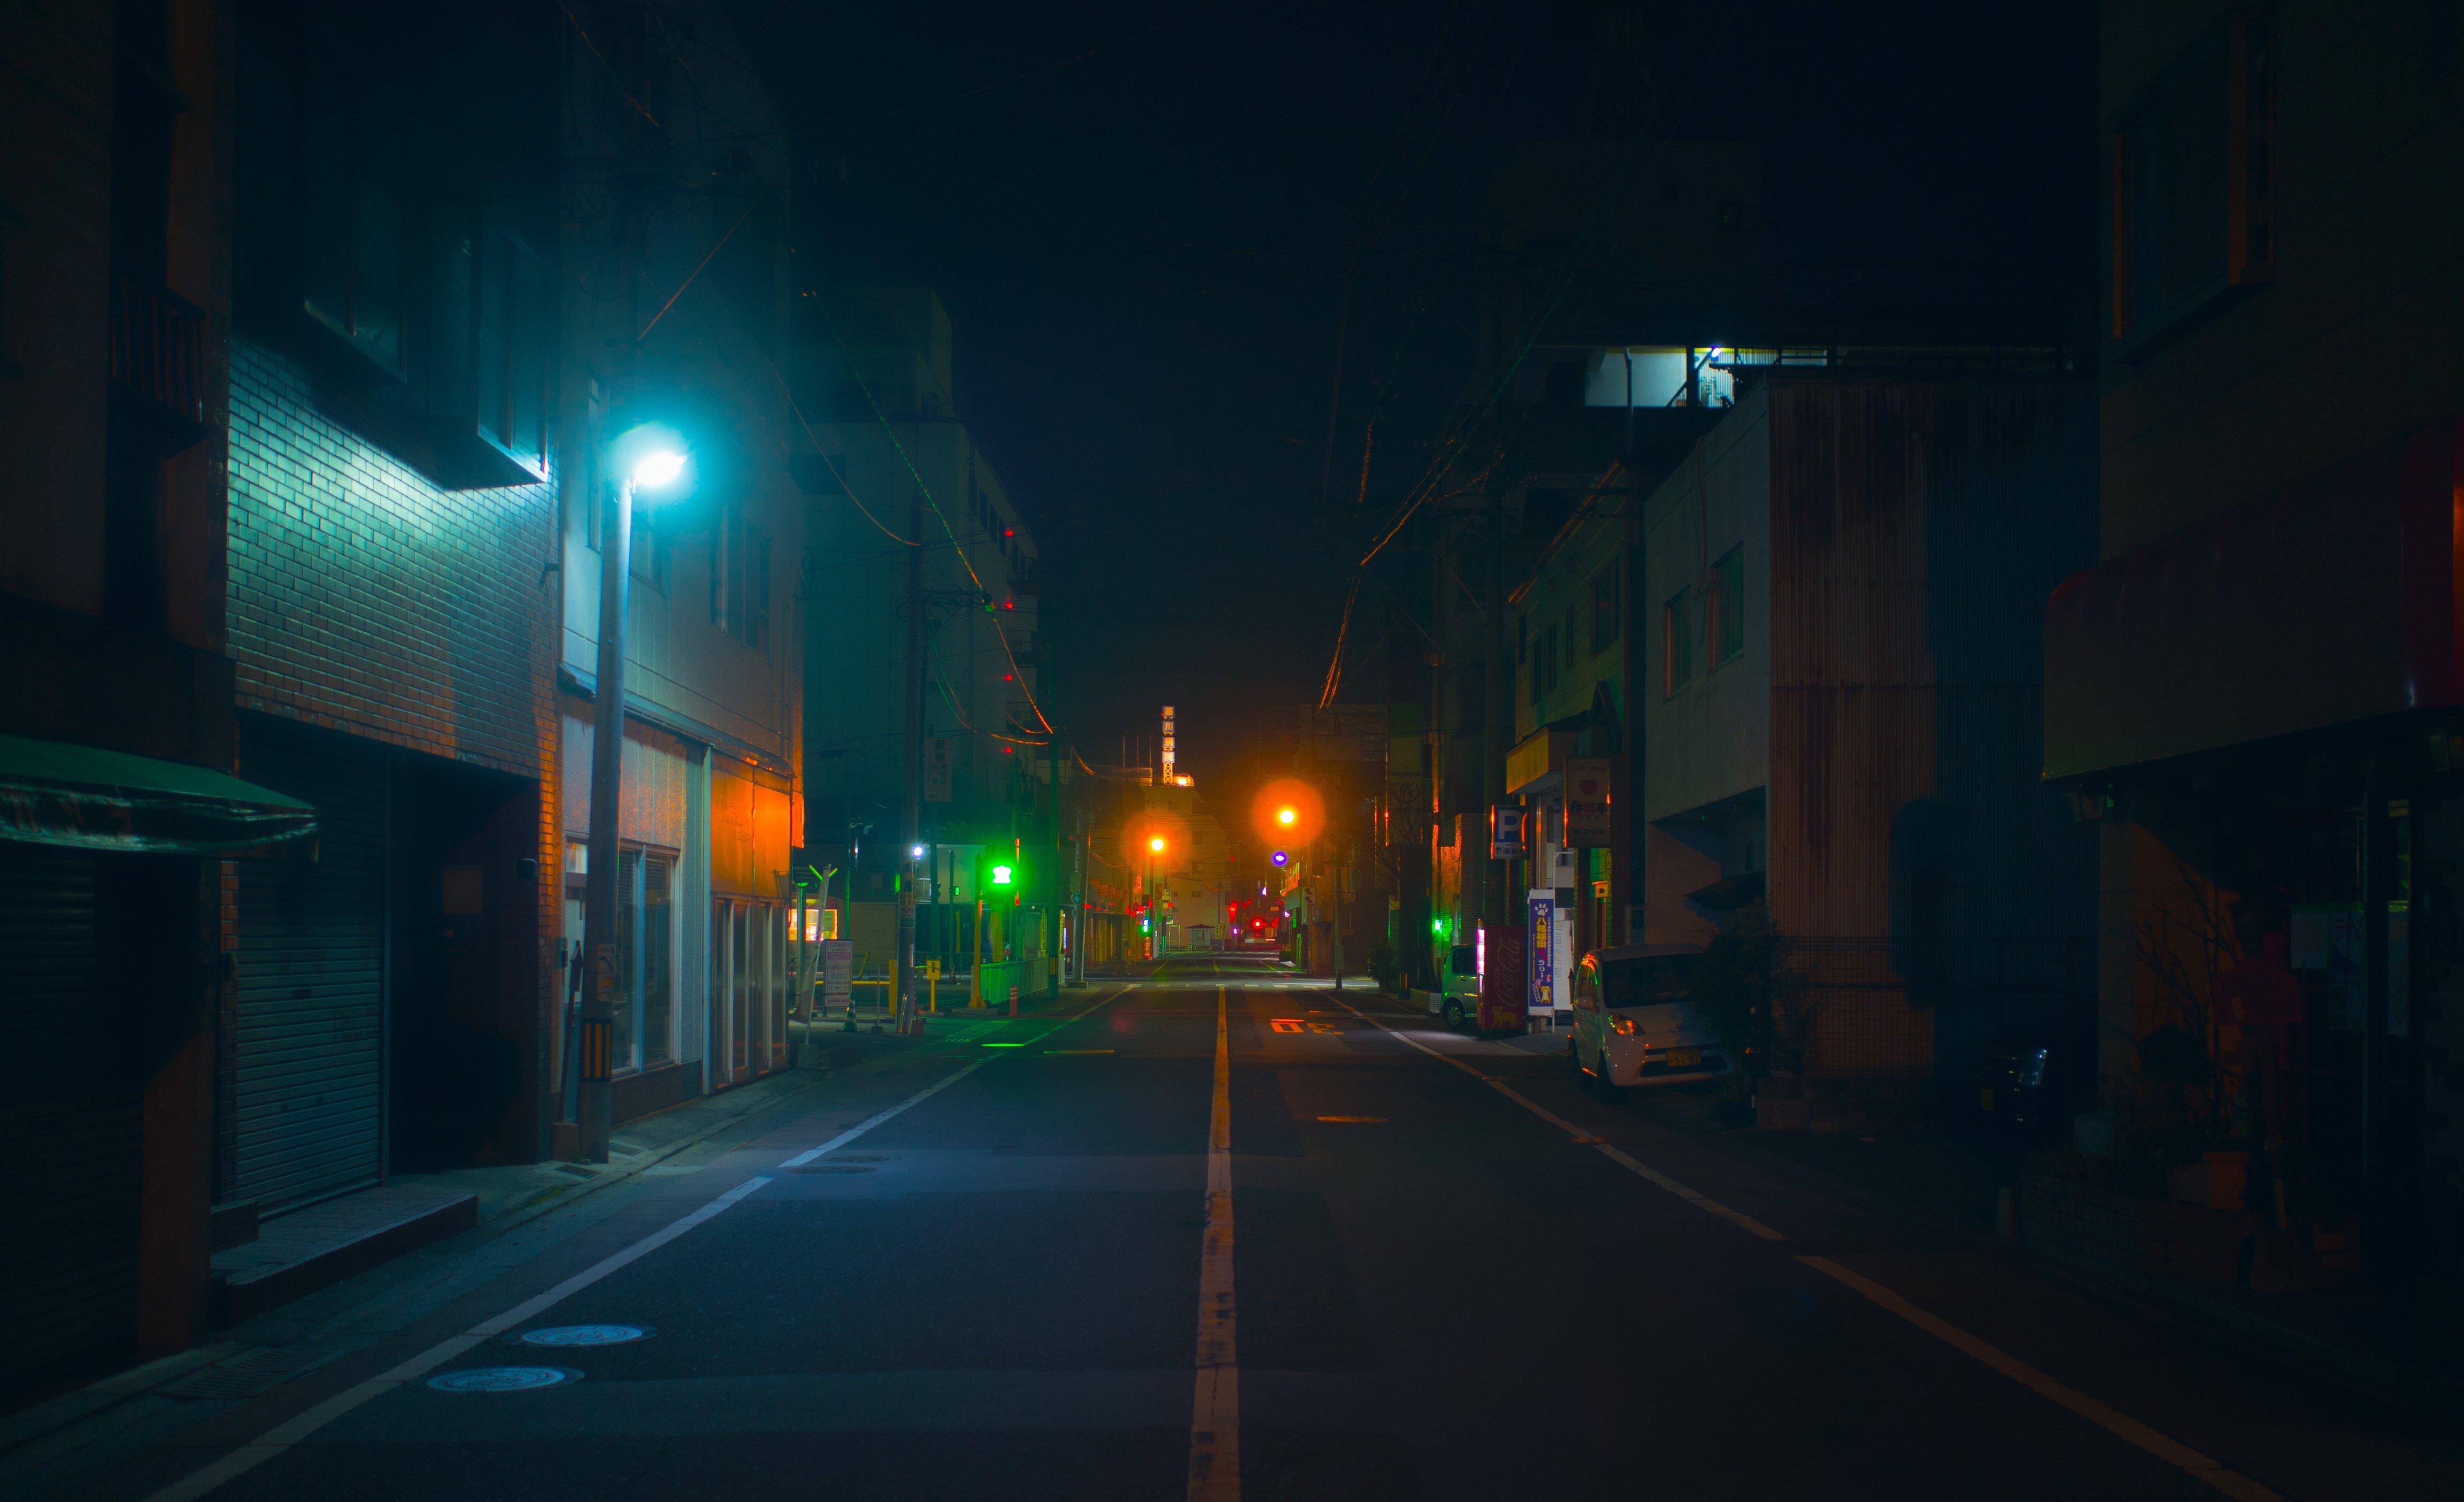 Japanese Night-time Street Photography - Micah Killian